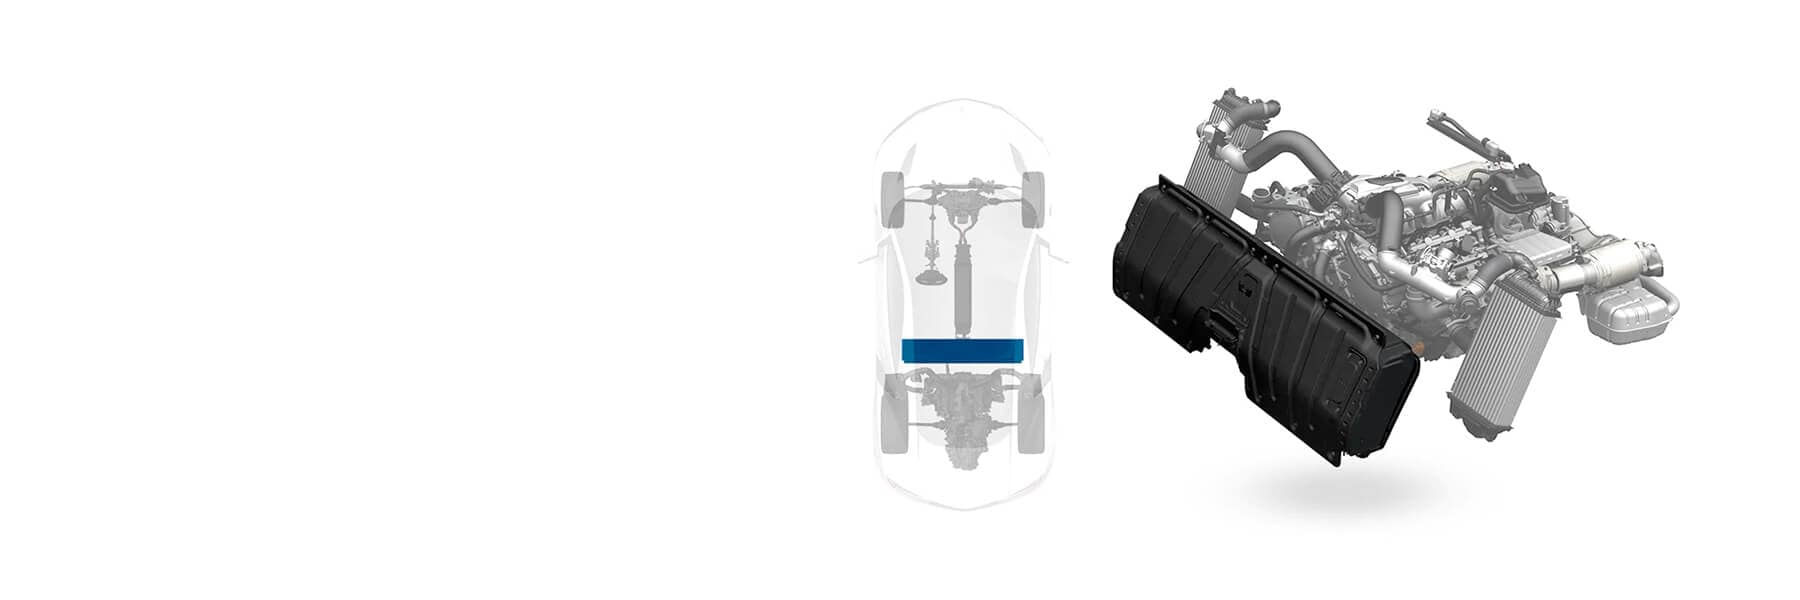 Acura Sport Hybrid Intelligent Power Unit Slider